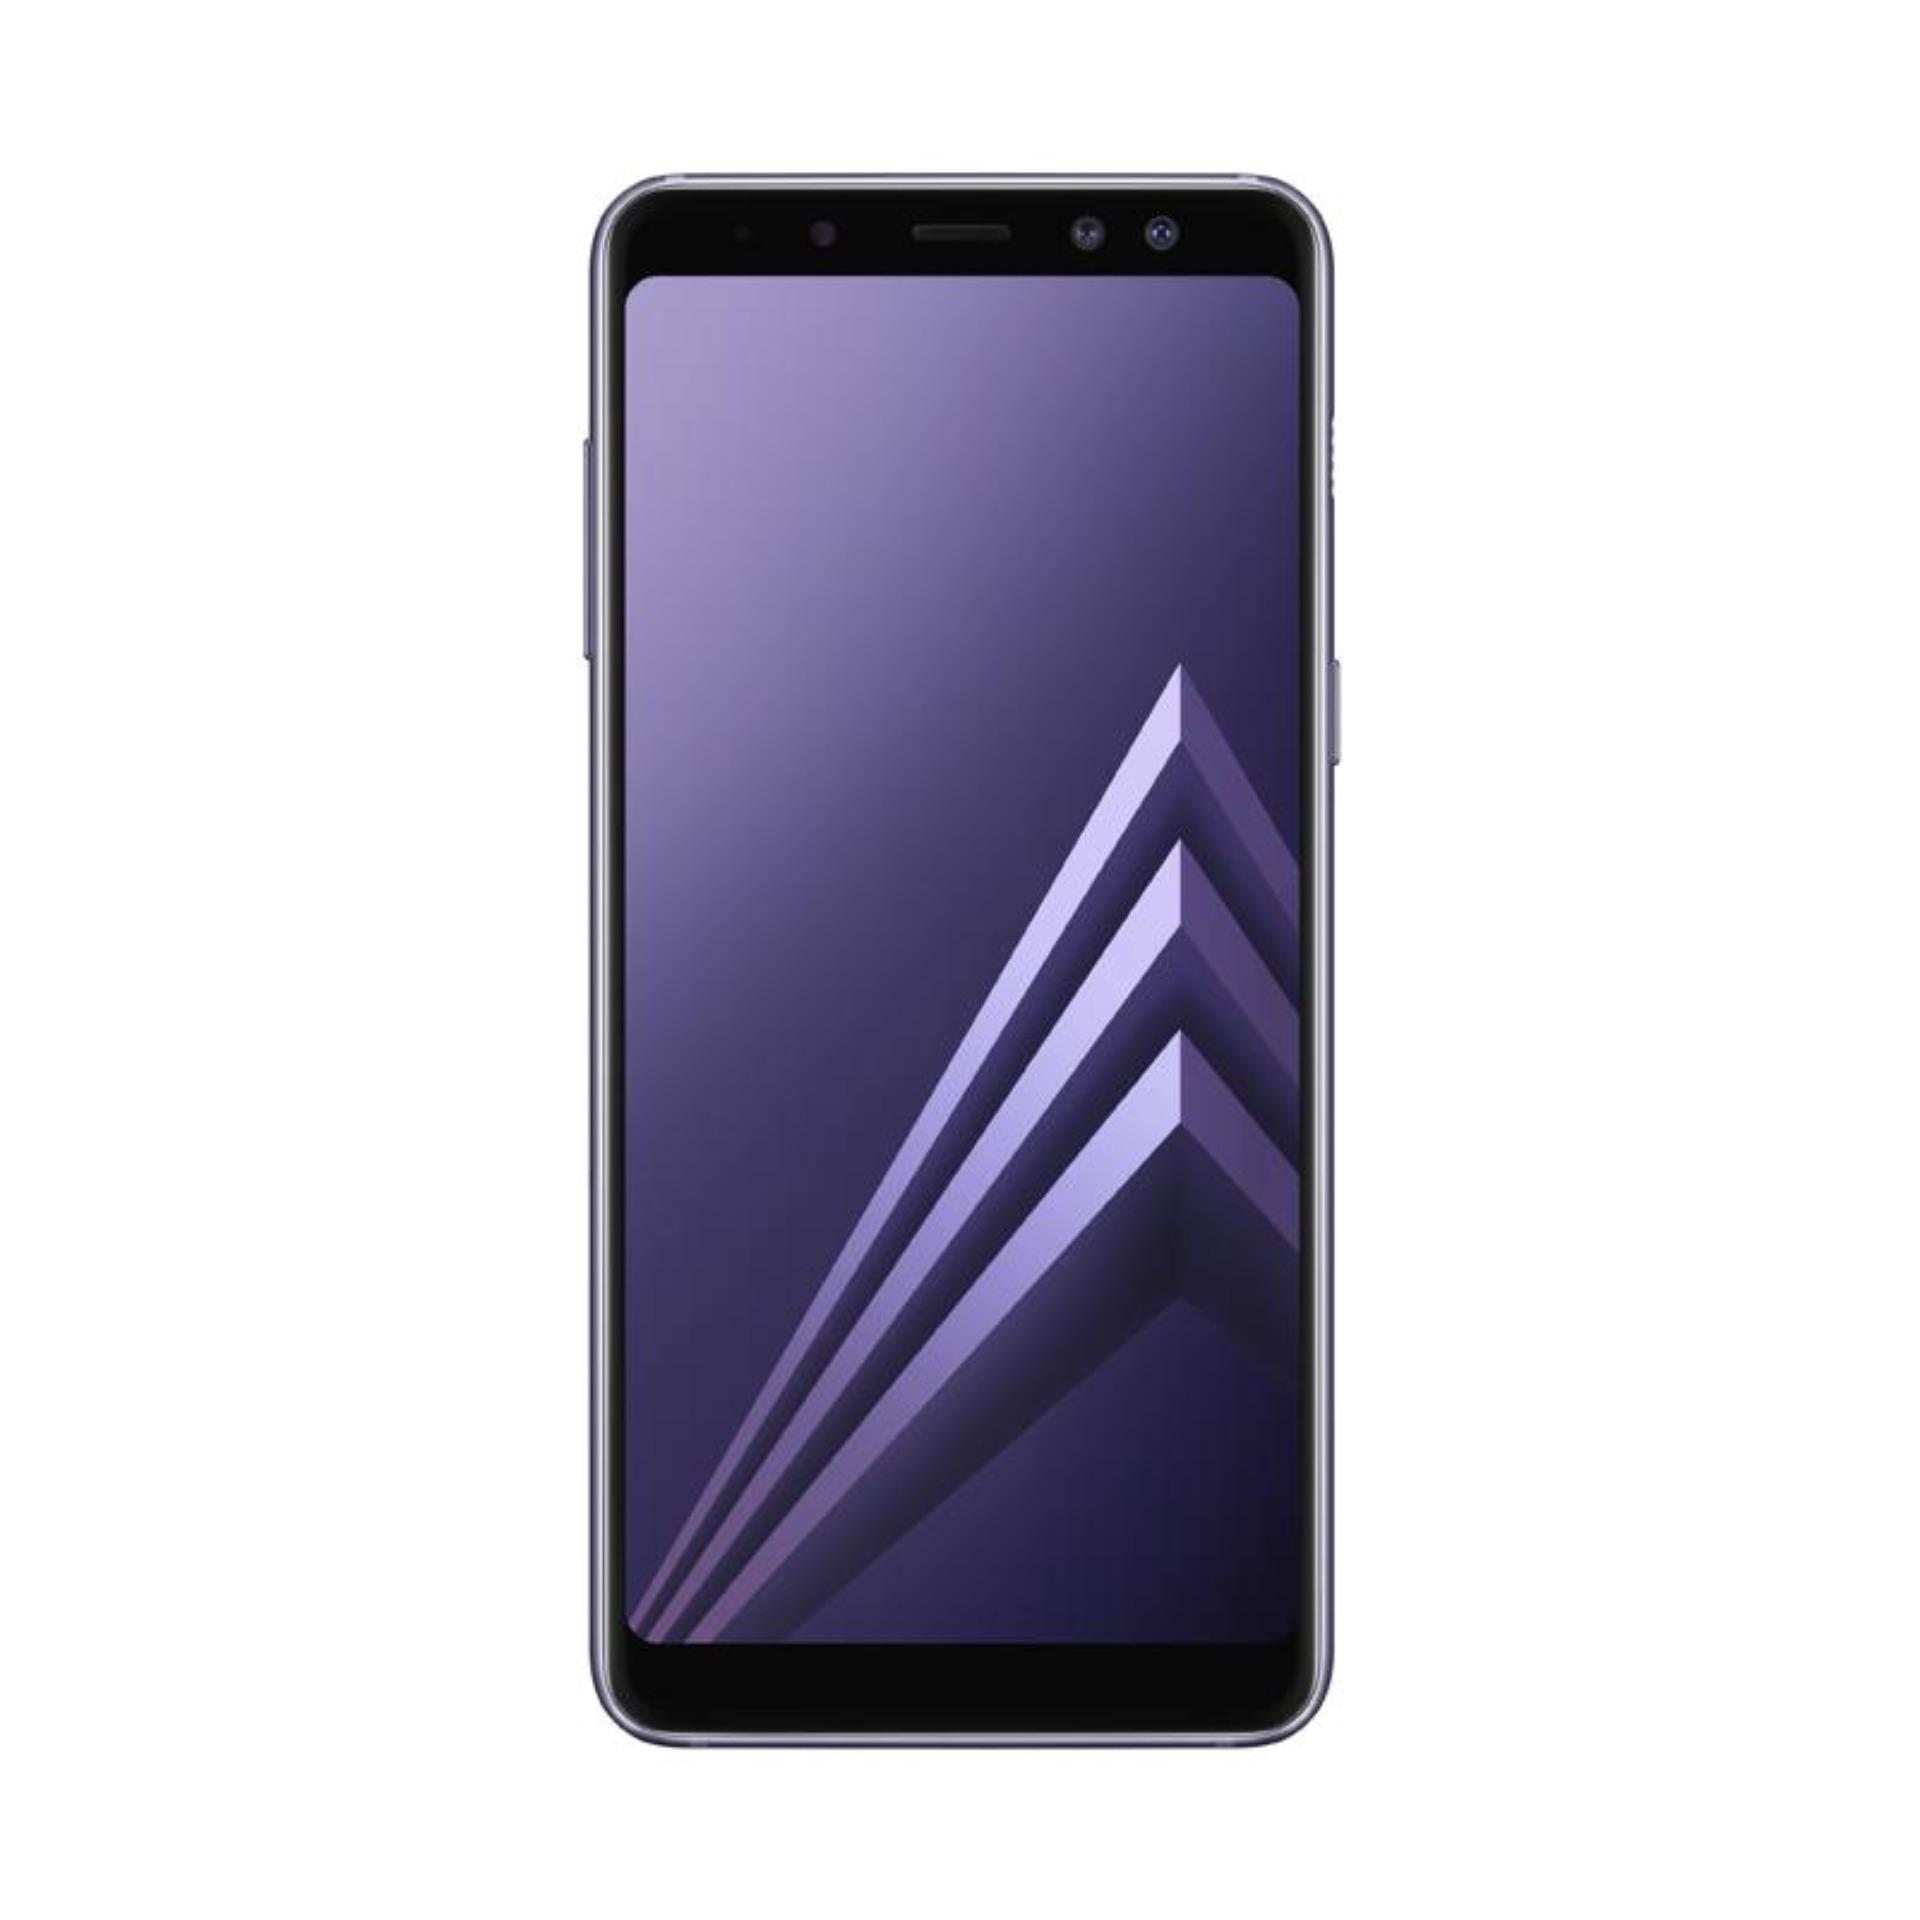 Kamera Belakang Dan Depan 16 MP Samsung Galaxy A8 2018 Smartphone